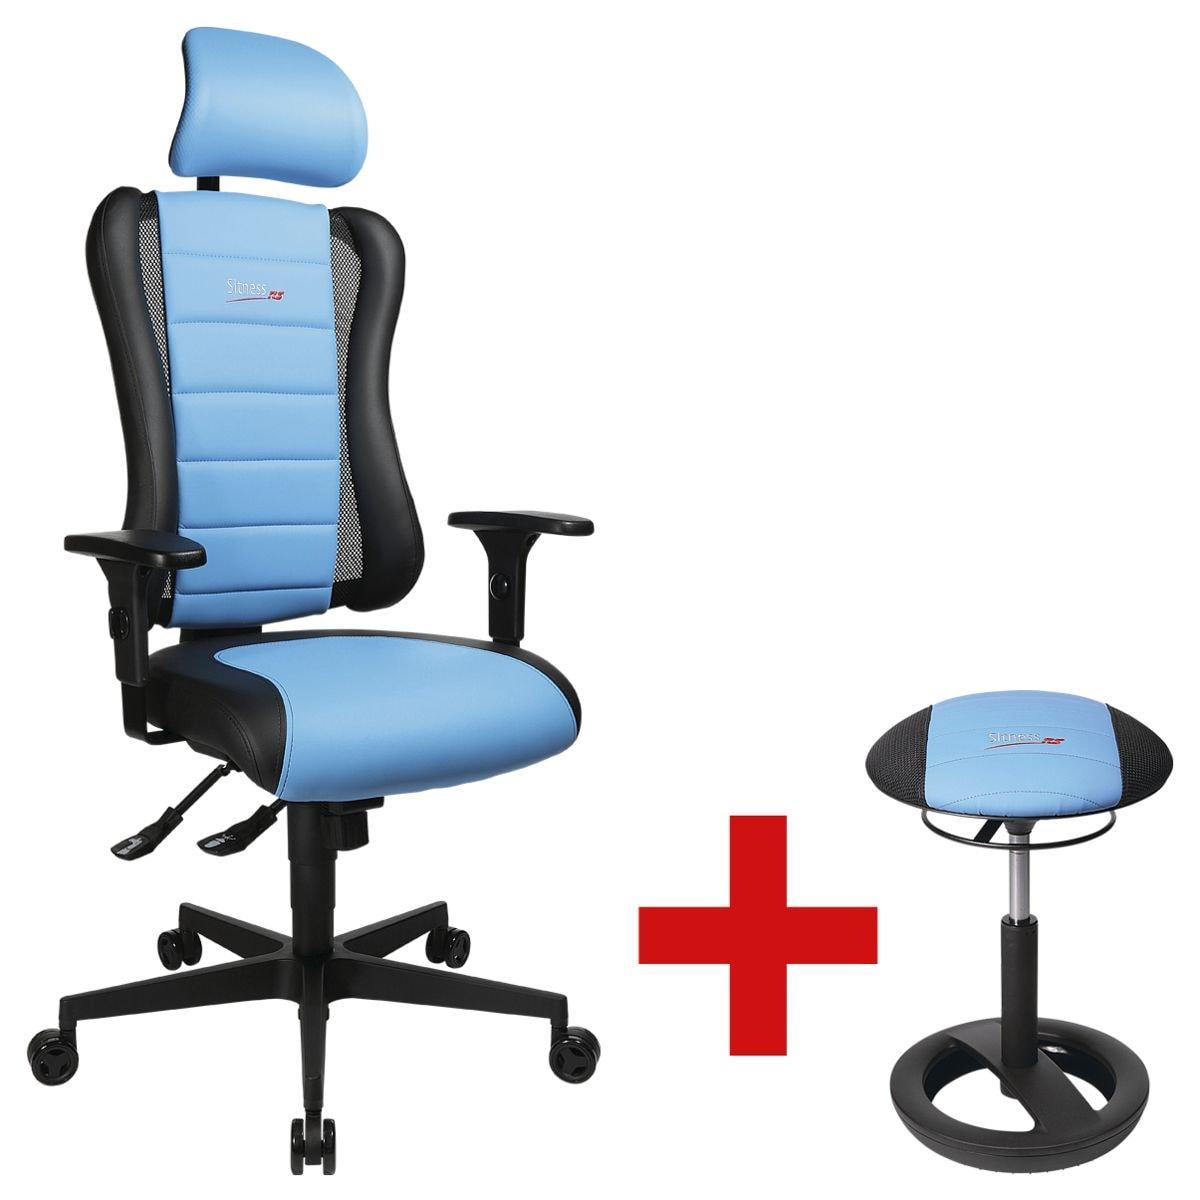 b rostuhl topstar sitness racer rs inkl sitzhocker sitness racer bob bei otto office. Black Bedroom Furniture Sets. Home Design Ideas